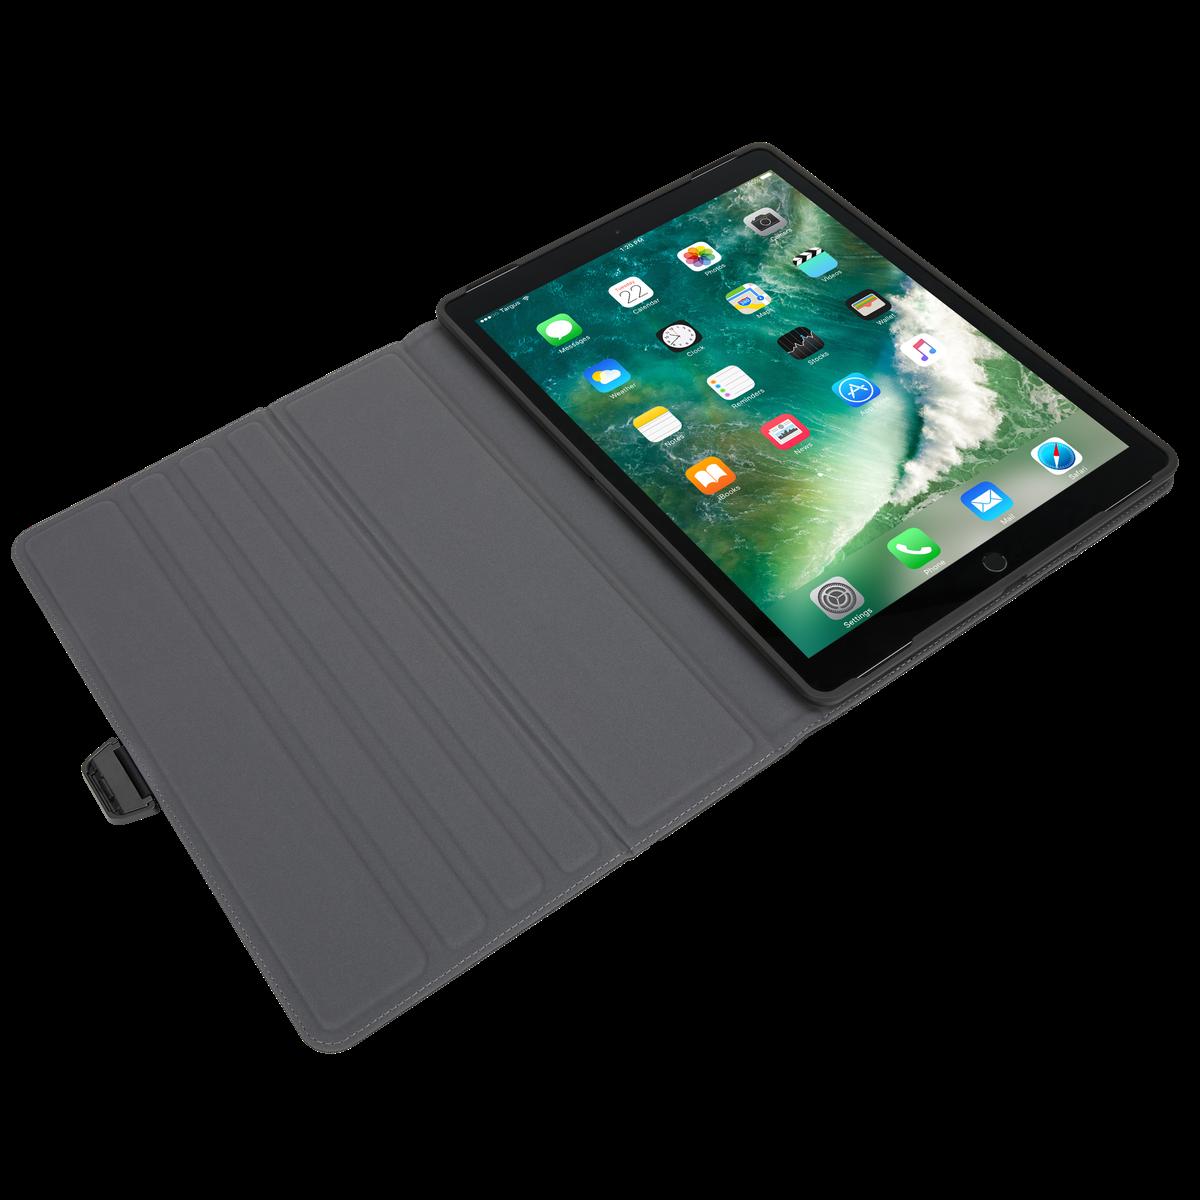 VersaVu® Premium Rotating Case for 12.9-inch iPad Pro® (2017)